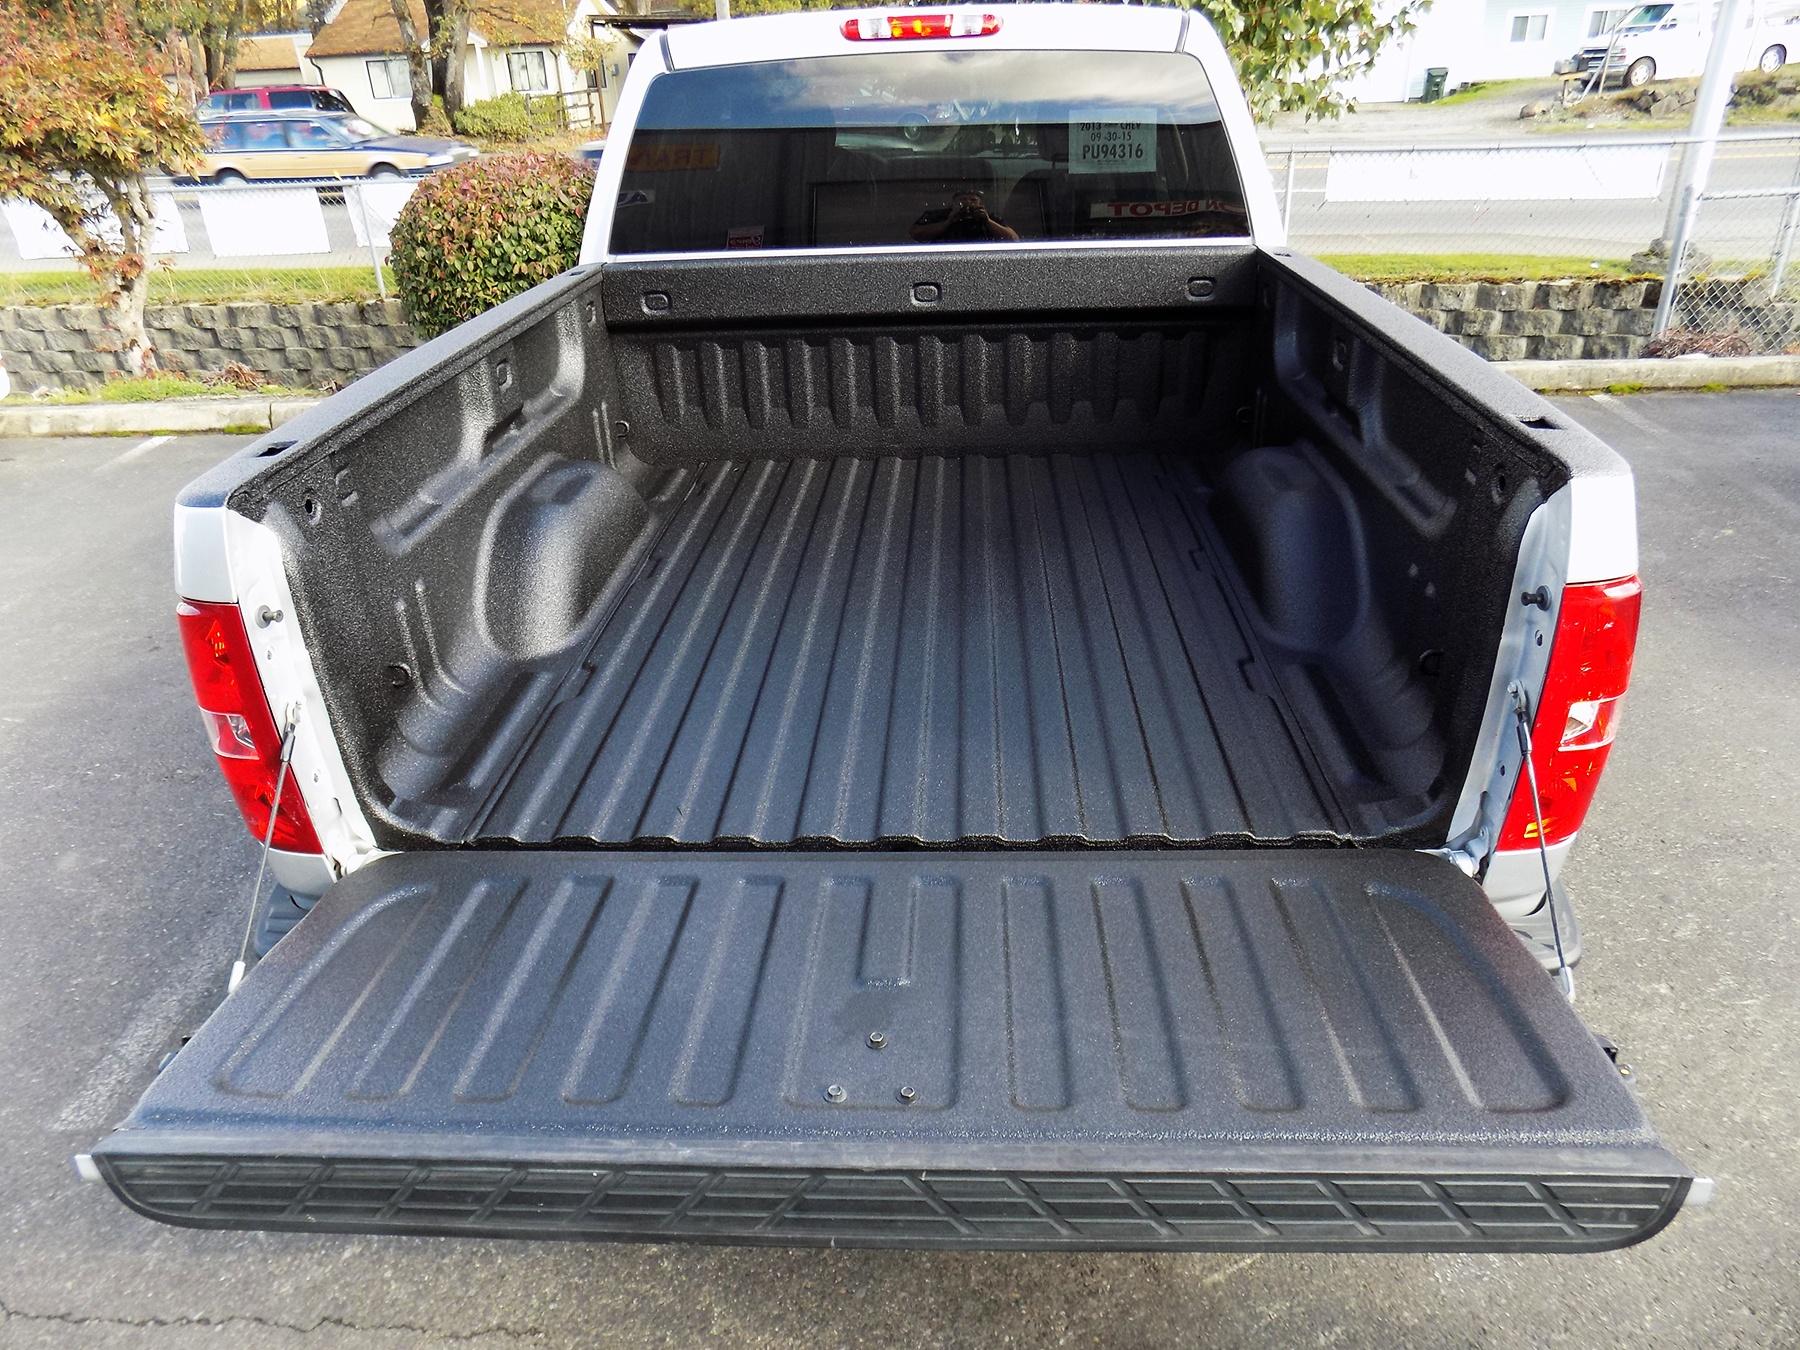 Bed Liner Spray >> Truck Bed Liners Sacramento Campway S Truck Accessories